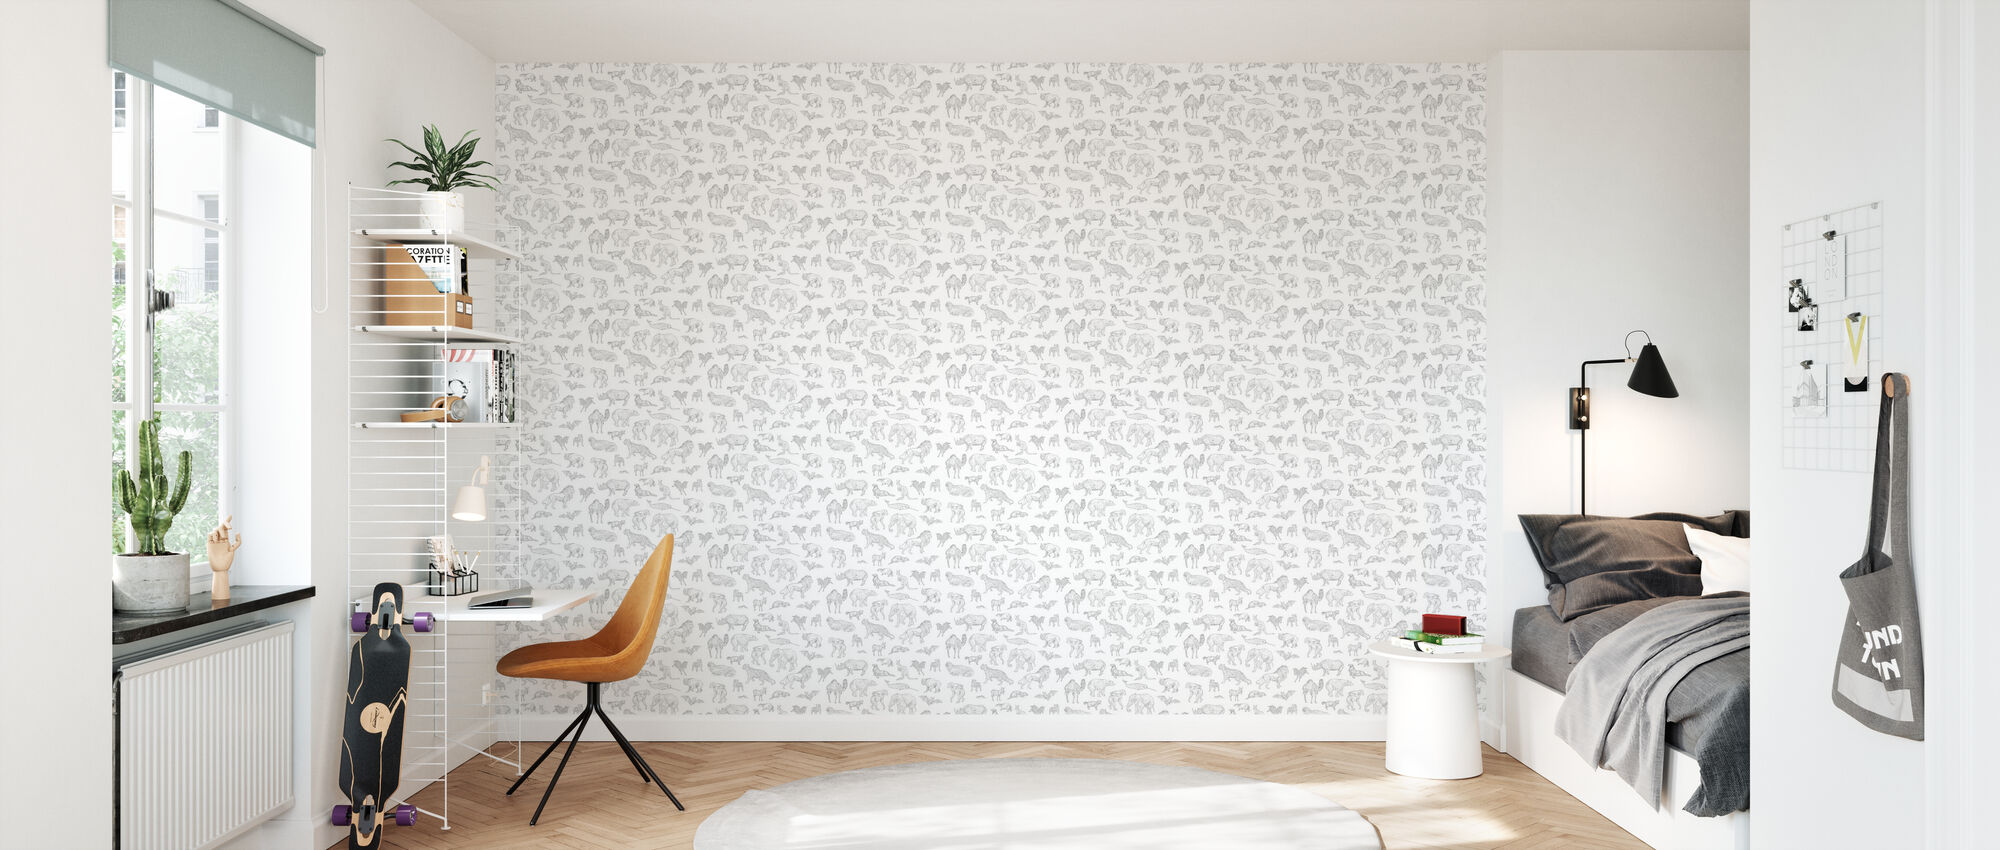 Lots of Animals Foggy - Wallpaper - Kids Room